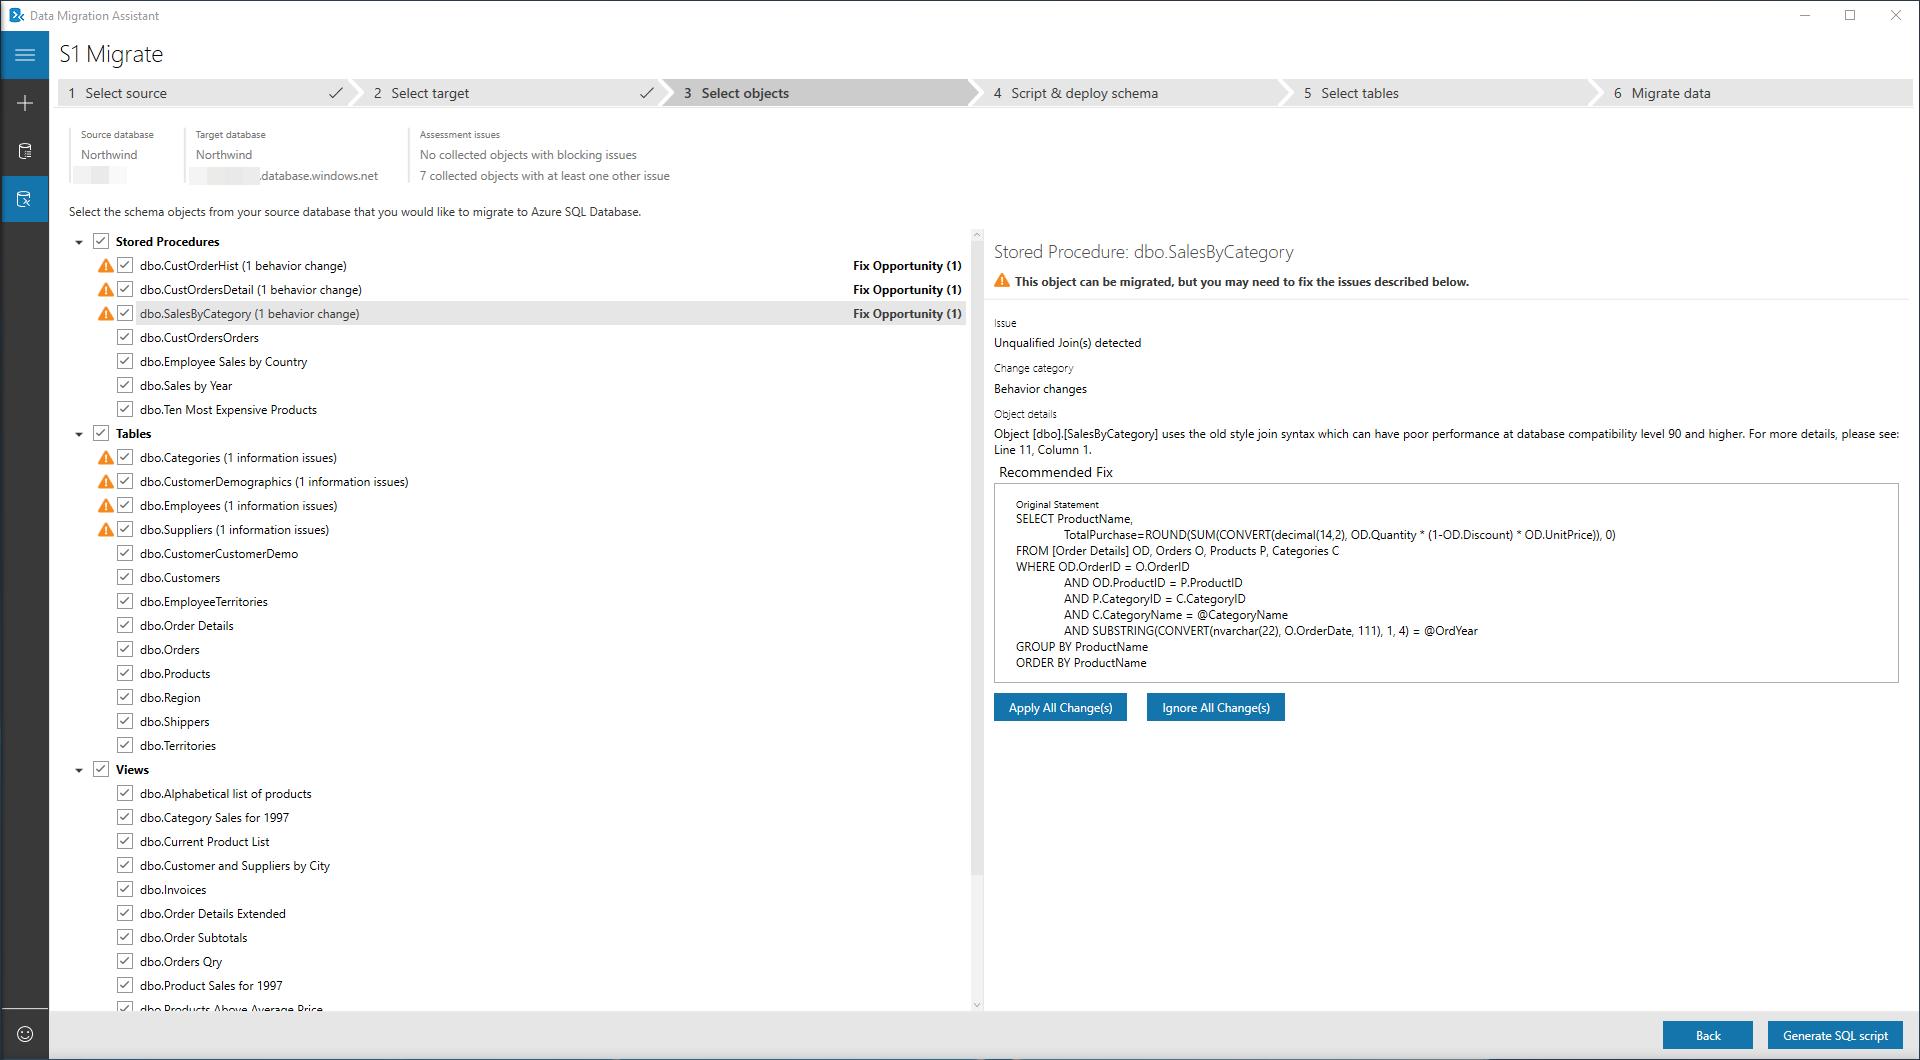 Preparing for a vCenter Server Migration using the vSphere 6.0 Update 2m  Migration Tool - Part 1 - VMware vSphere Blog